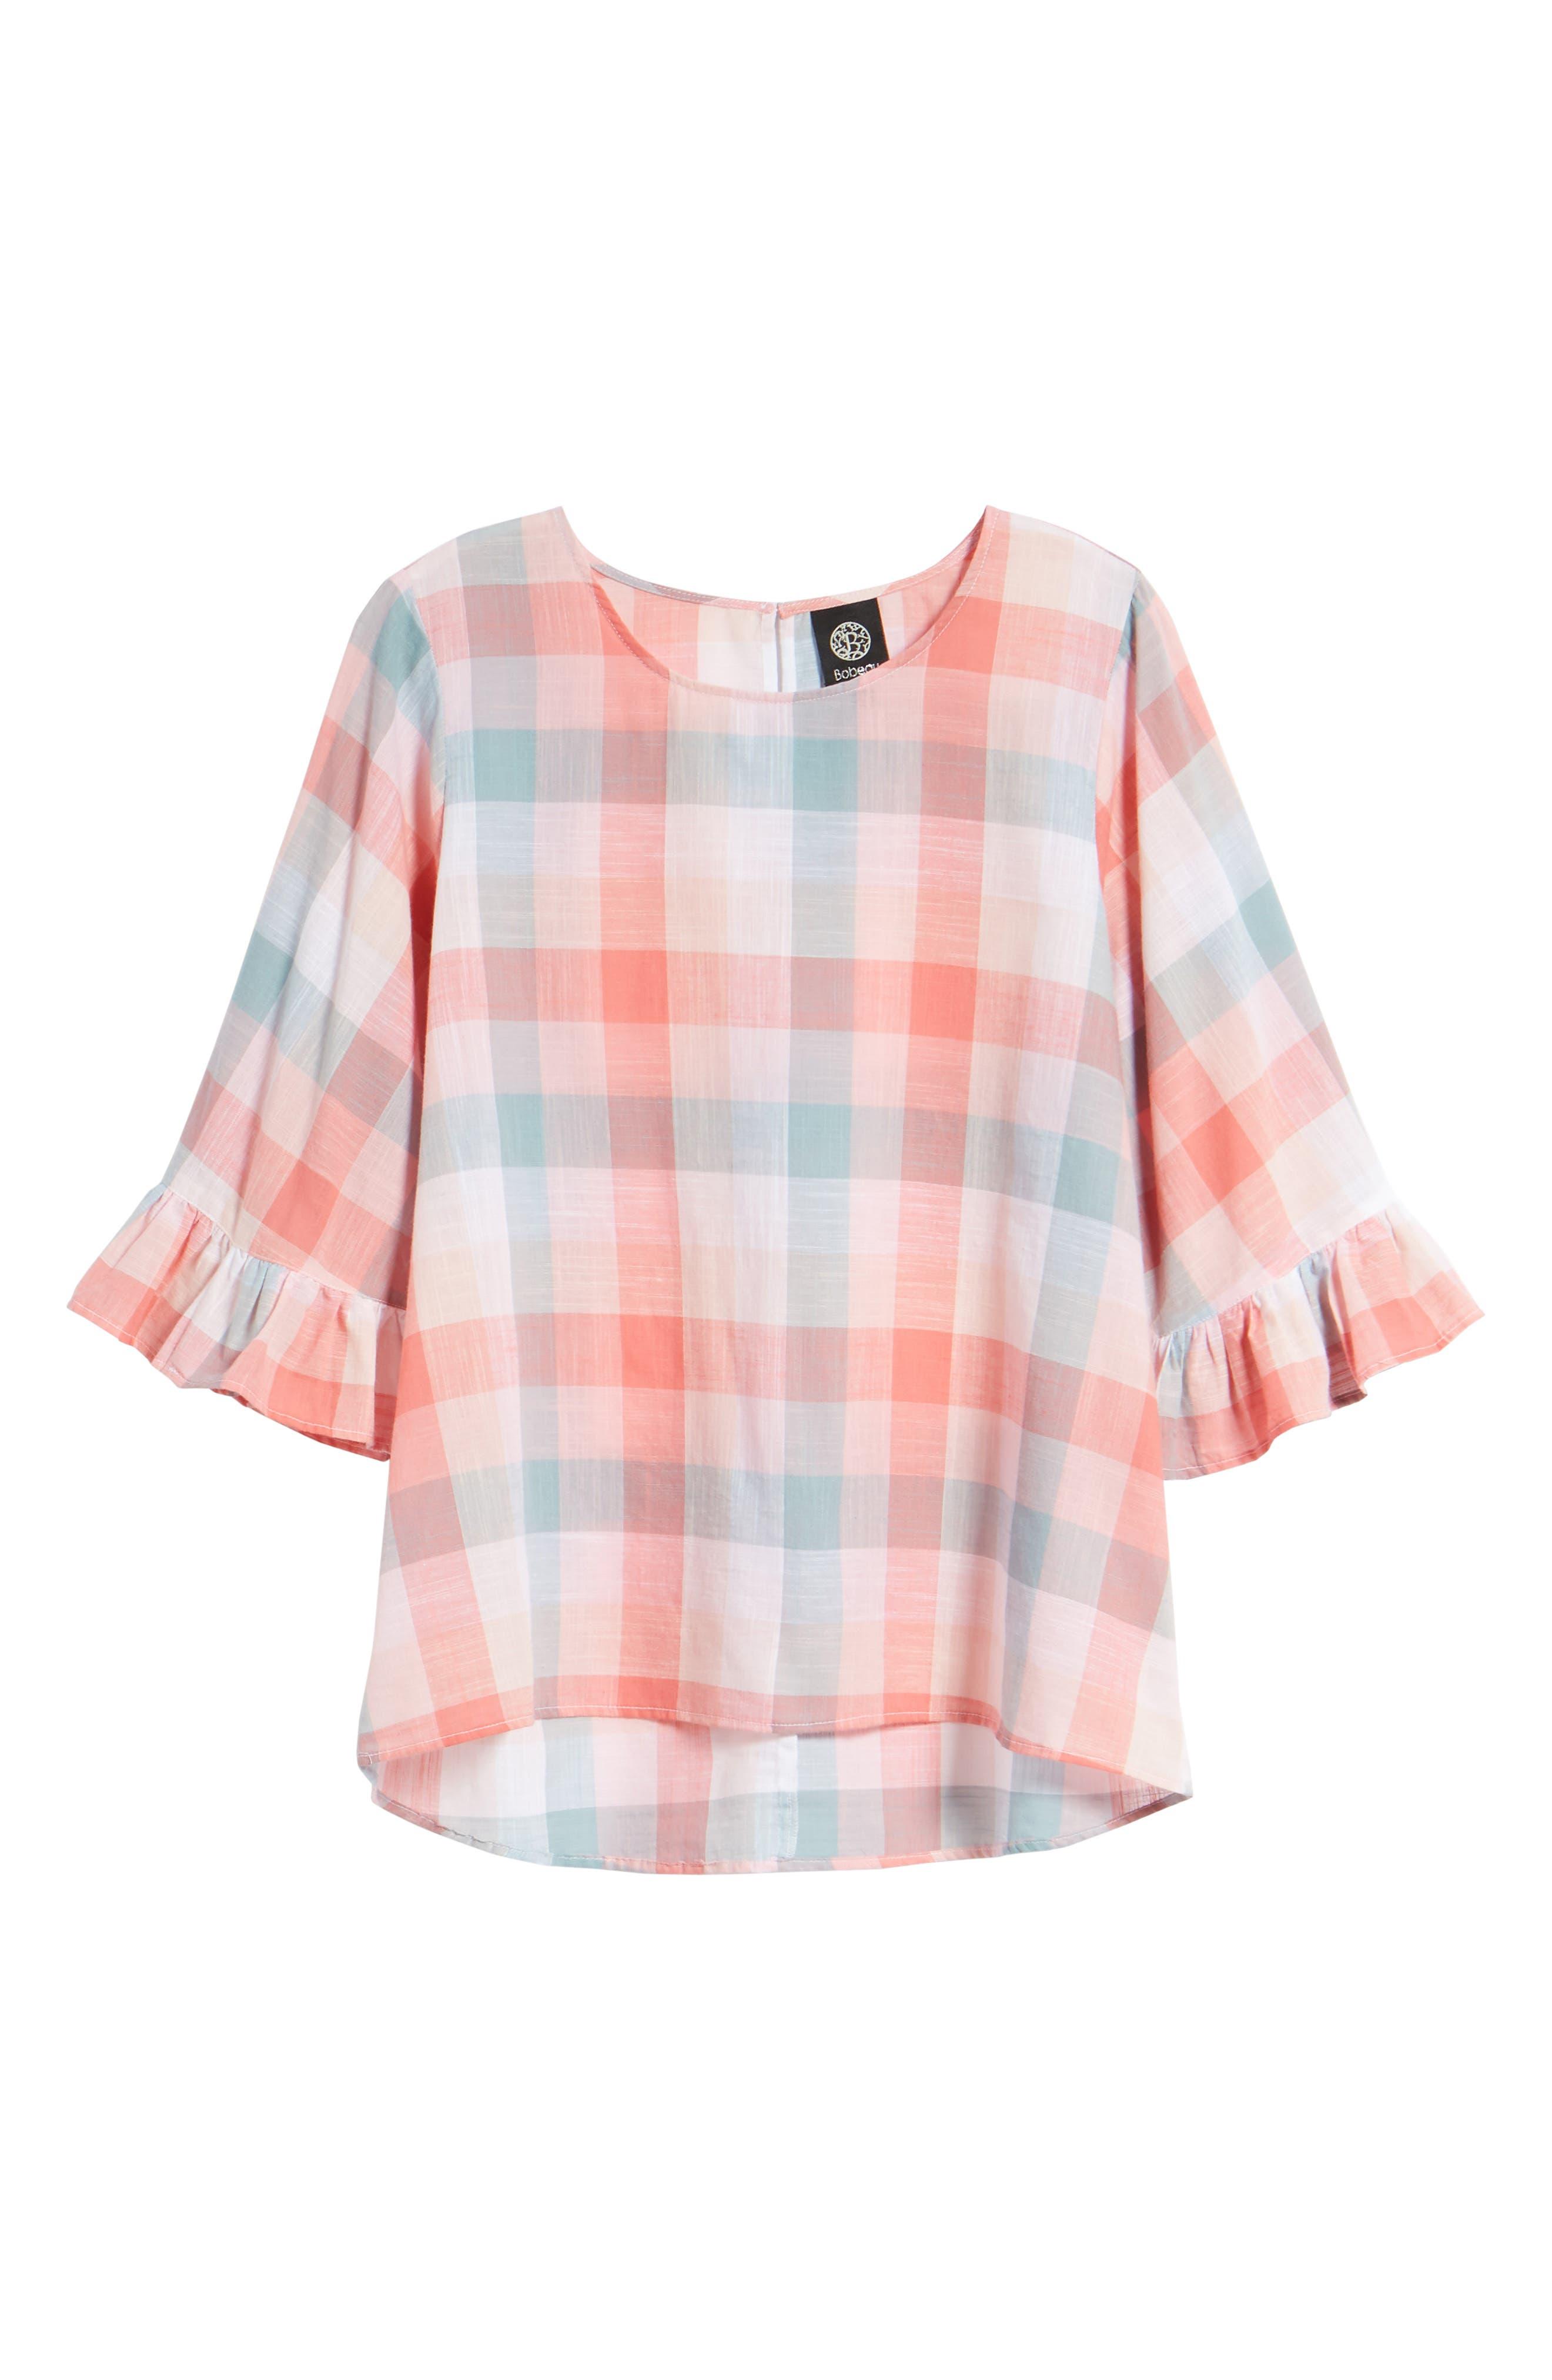 Pastel Plaid Ruffle Sleeve Cotton Top,                             Alternate thumbnail 7, color,                             Pink Plaid